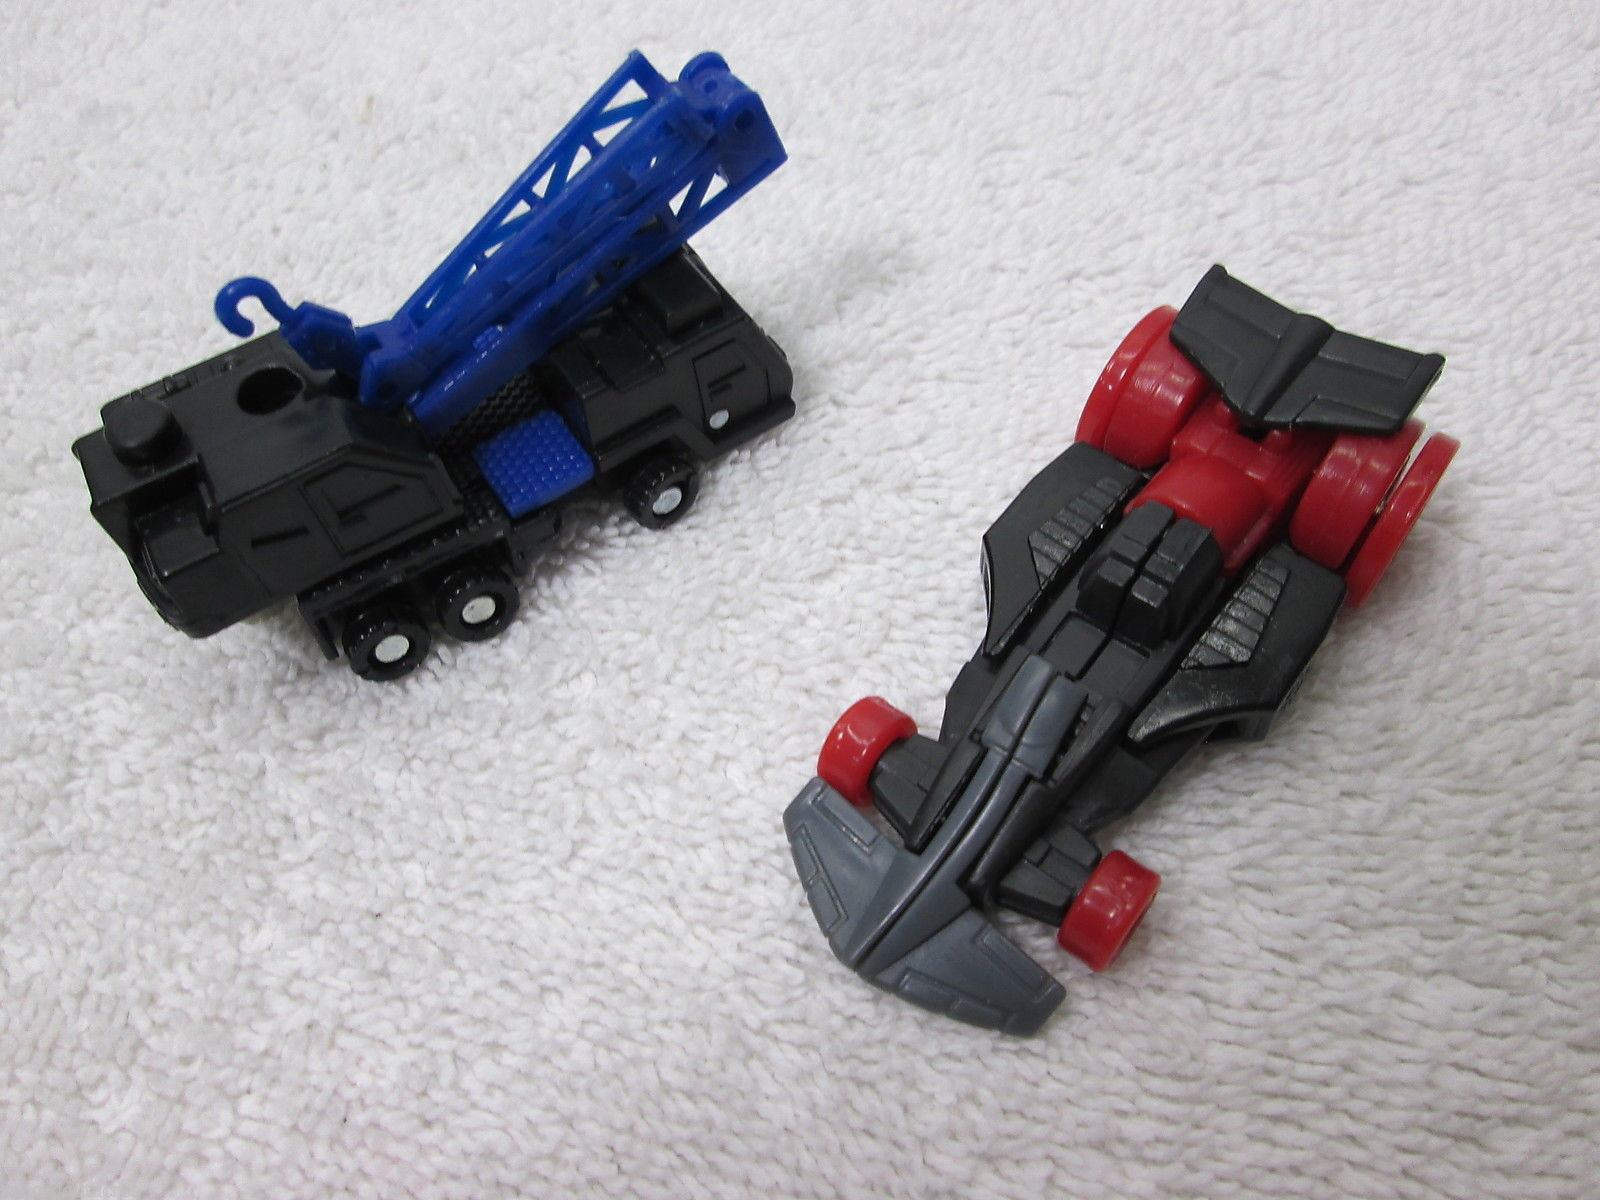 Transformers Energon Prowl w/Longarm & Starscream w/Zapmaster - Hasbro 2004